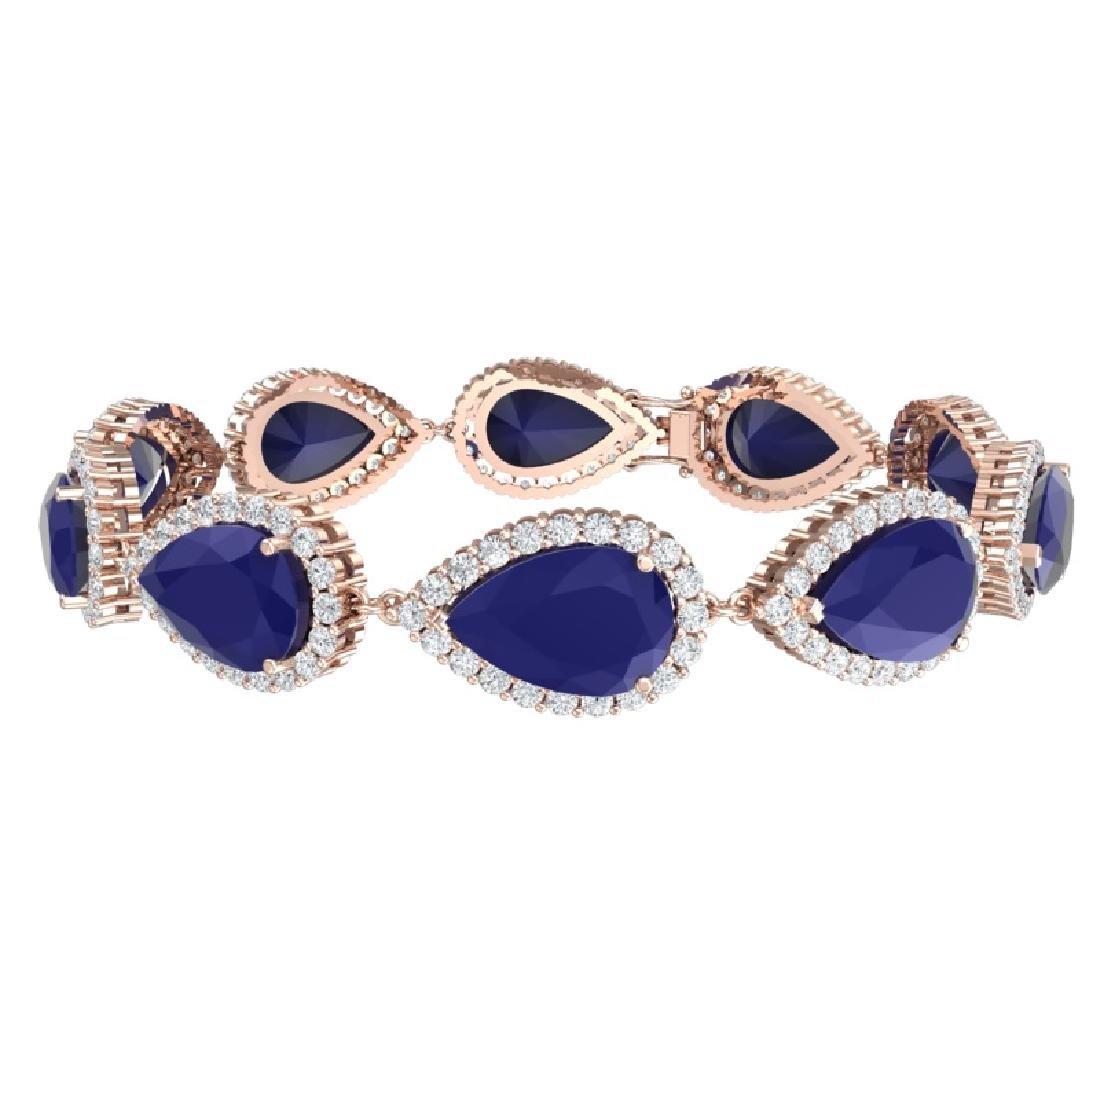 42 CTW Royalty Sapphire & VS Diamond Bracelet 18K Rose - 3